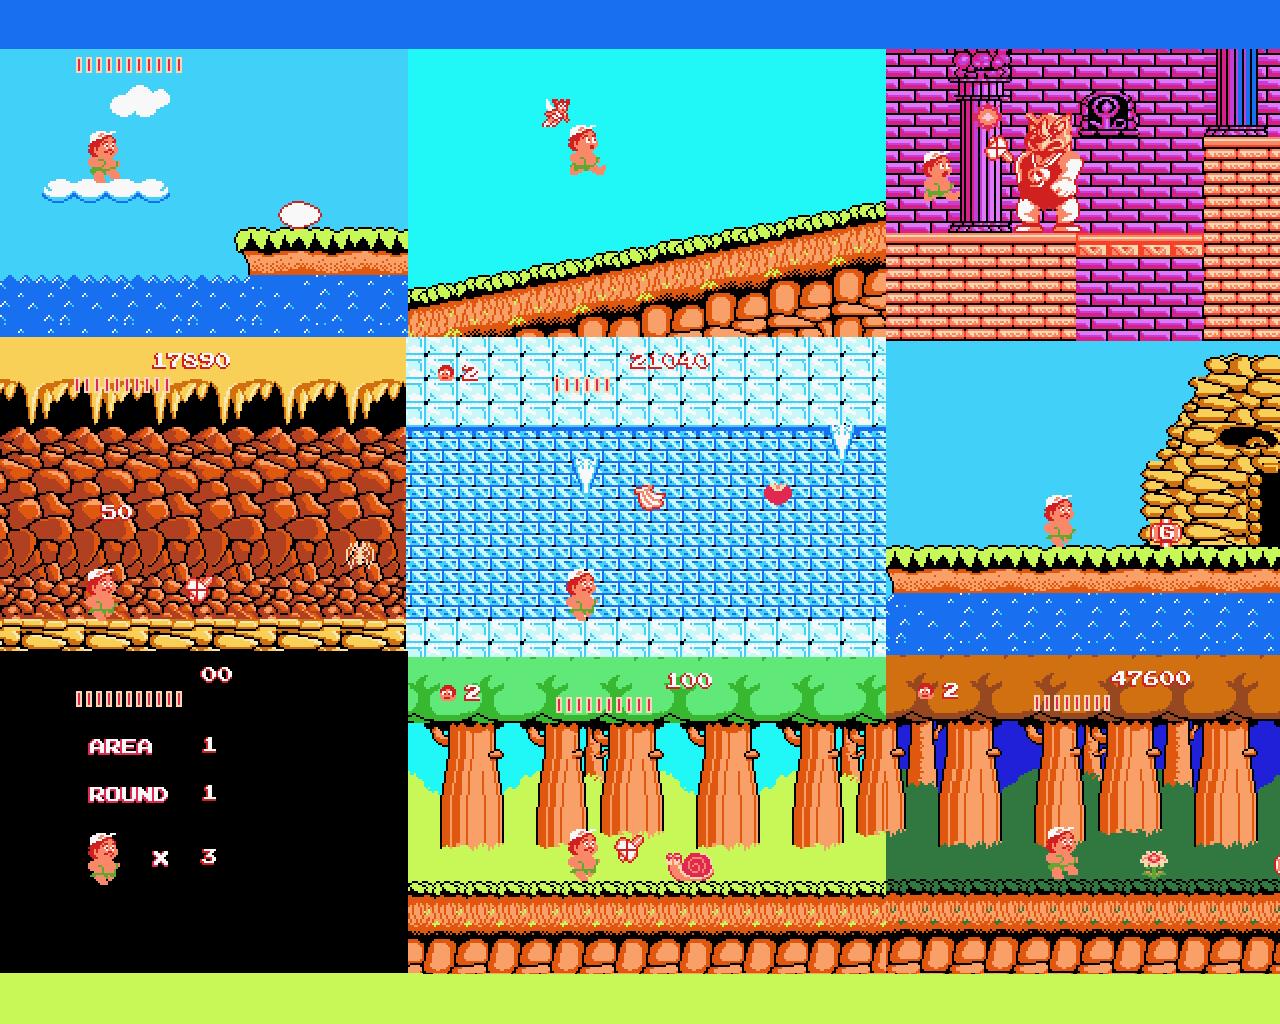 Pixel Art Adventure Island Nes High Res Wallpaper 8 Bit City